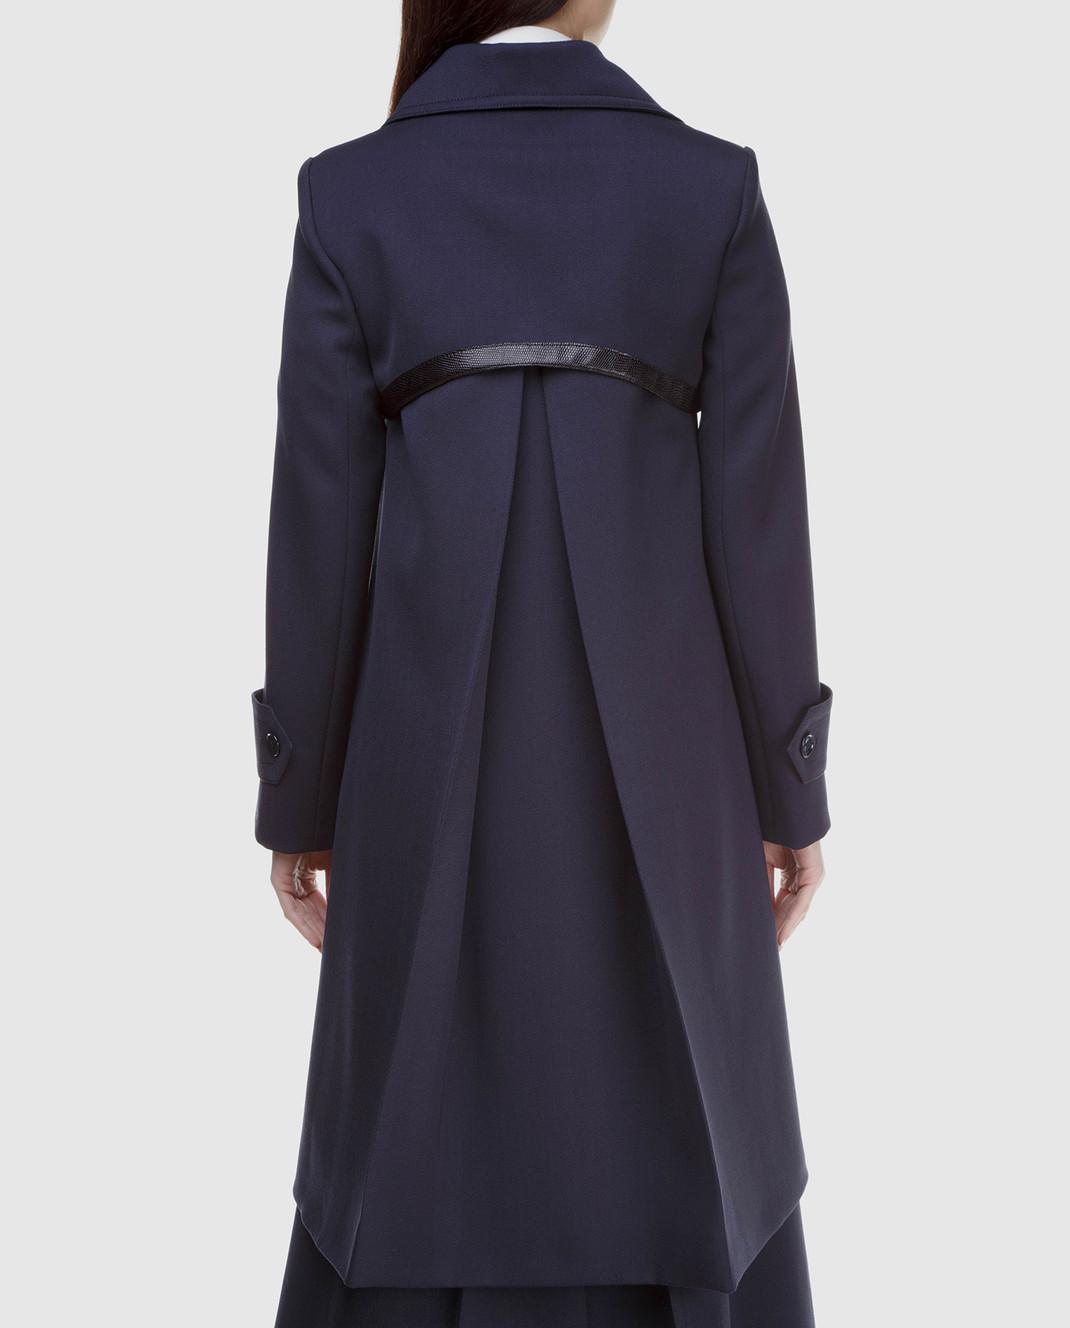 NINA RICCI Темно-синее пальто из шерсти 17HCMA016WV0220 изображение 4